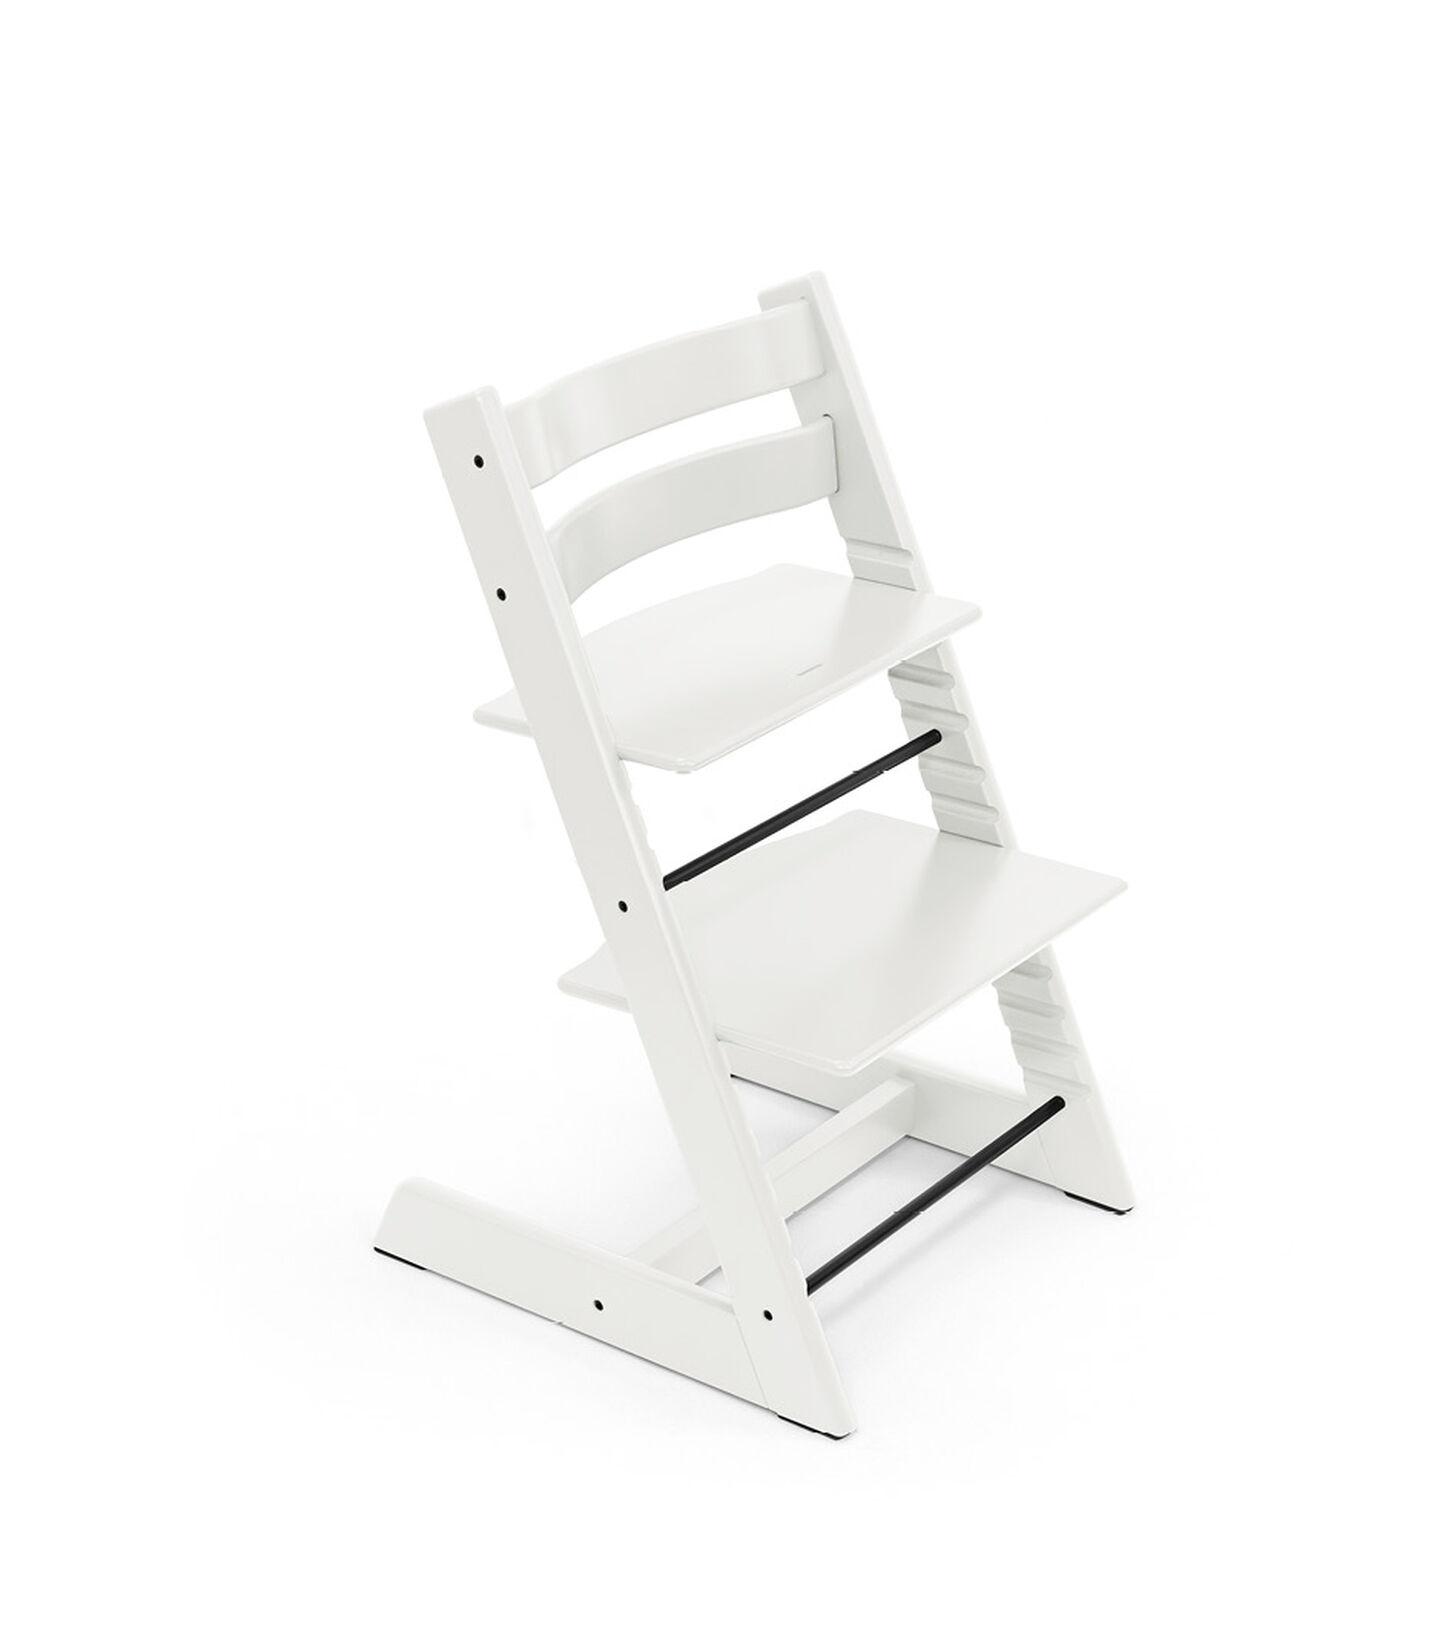 Tripp Trapp® Chair White, White, mainview view 1